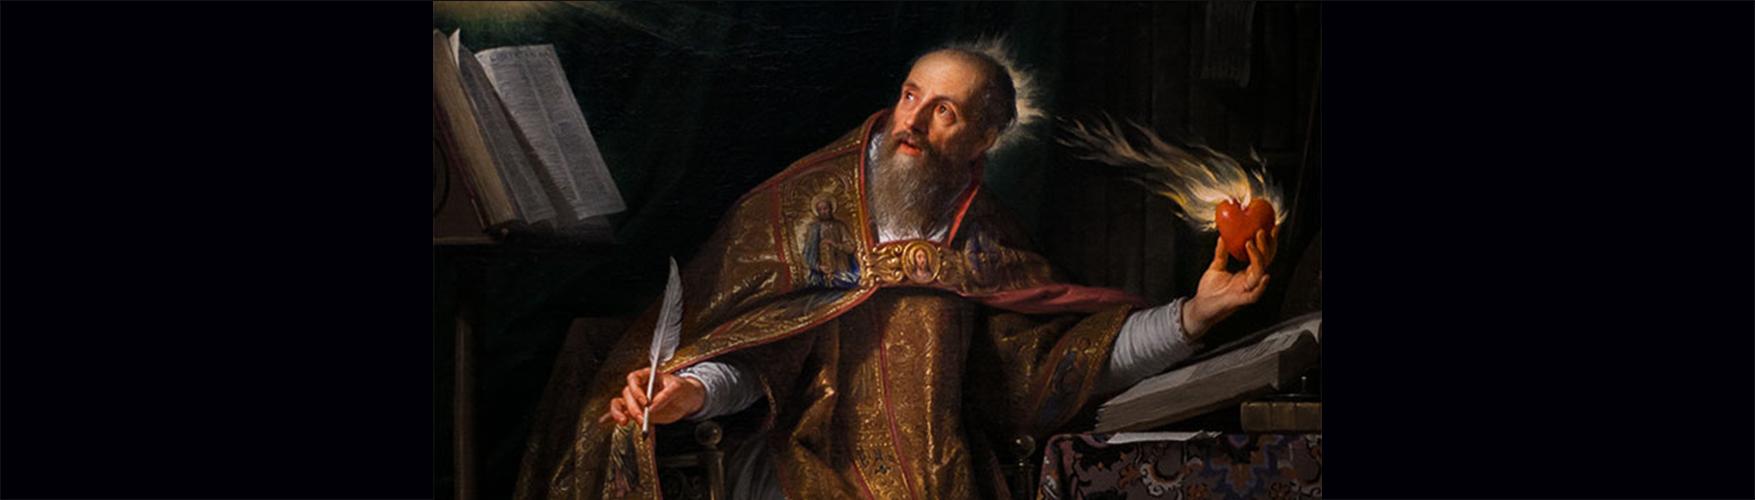 santo-agostinho-3 redimensionada